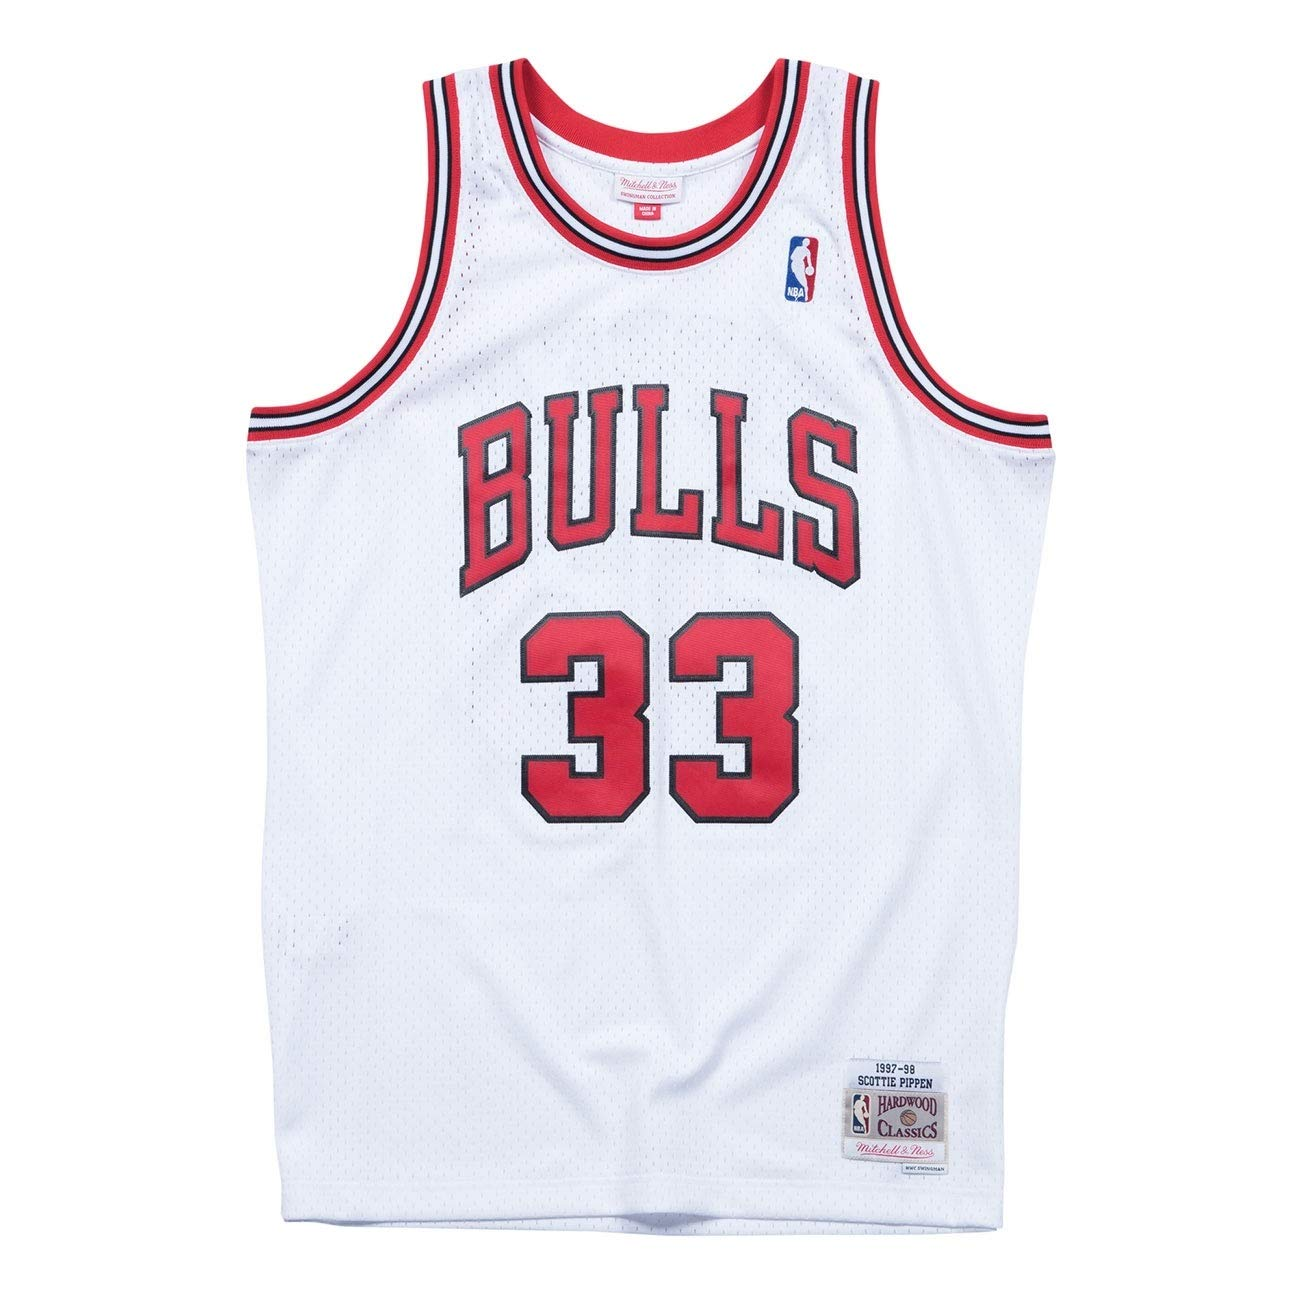 Mitchell /& Ness Chicago Bulls 33 Scottie Pippen Swingman Retro Trikot Jersey